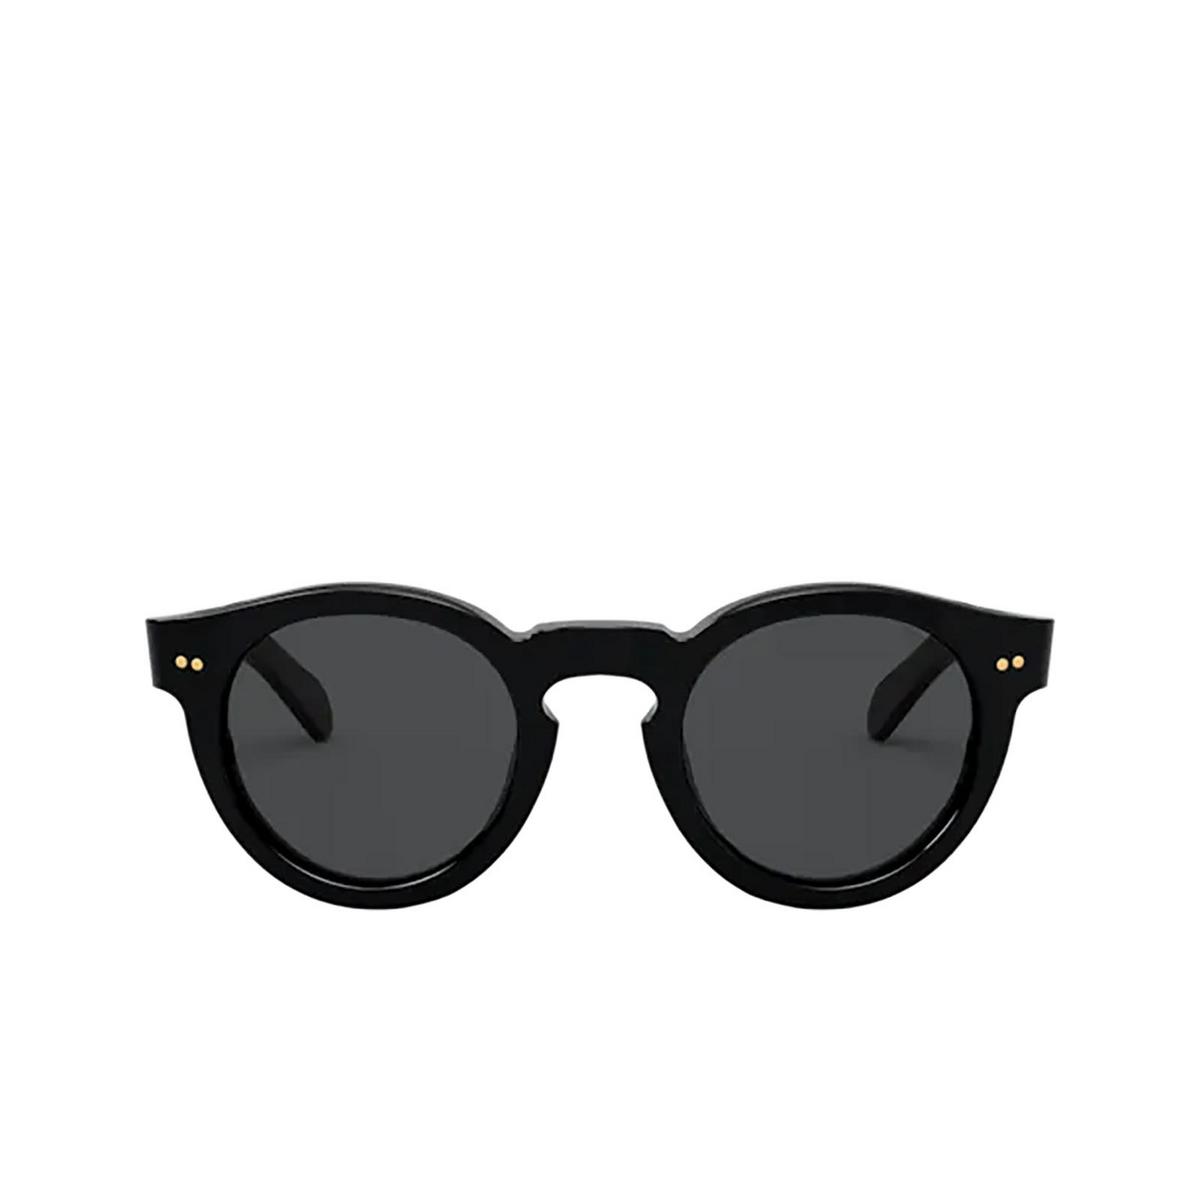 Polo Ralph Lauren® Round Sunglasses: PH4165 color Shiny Black 500187 - front view.